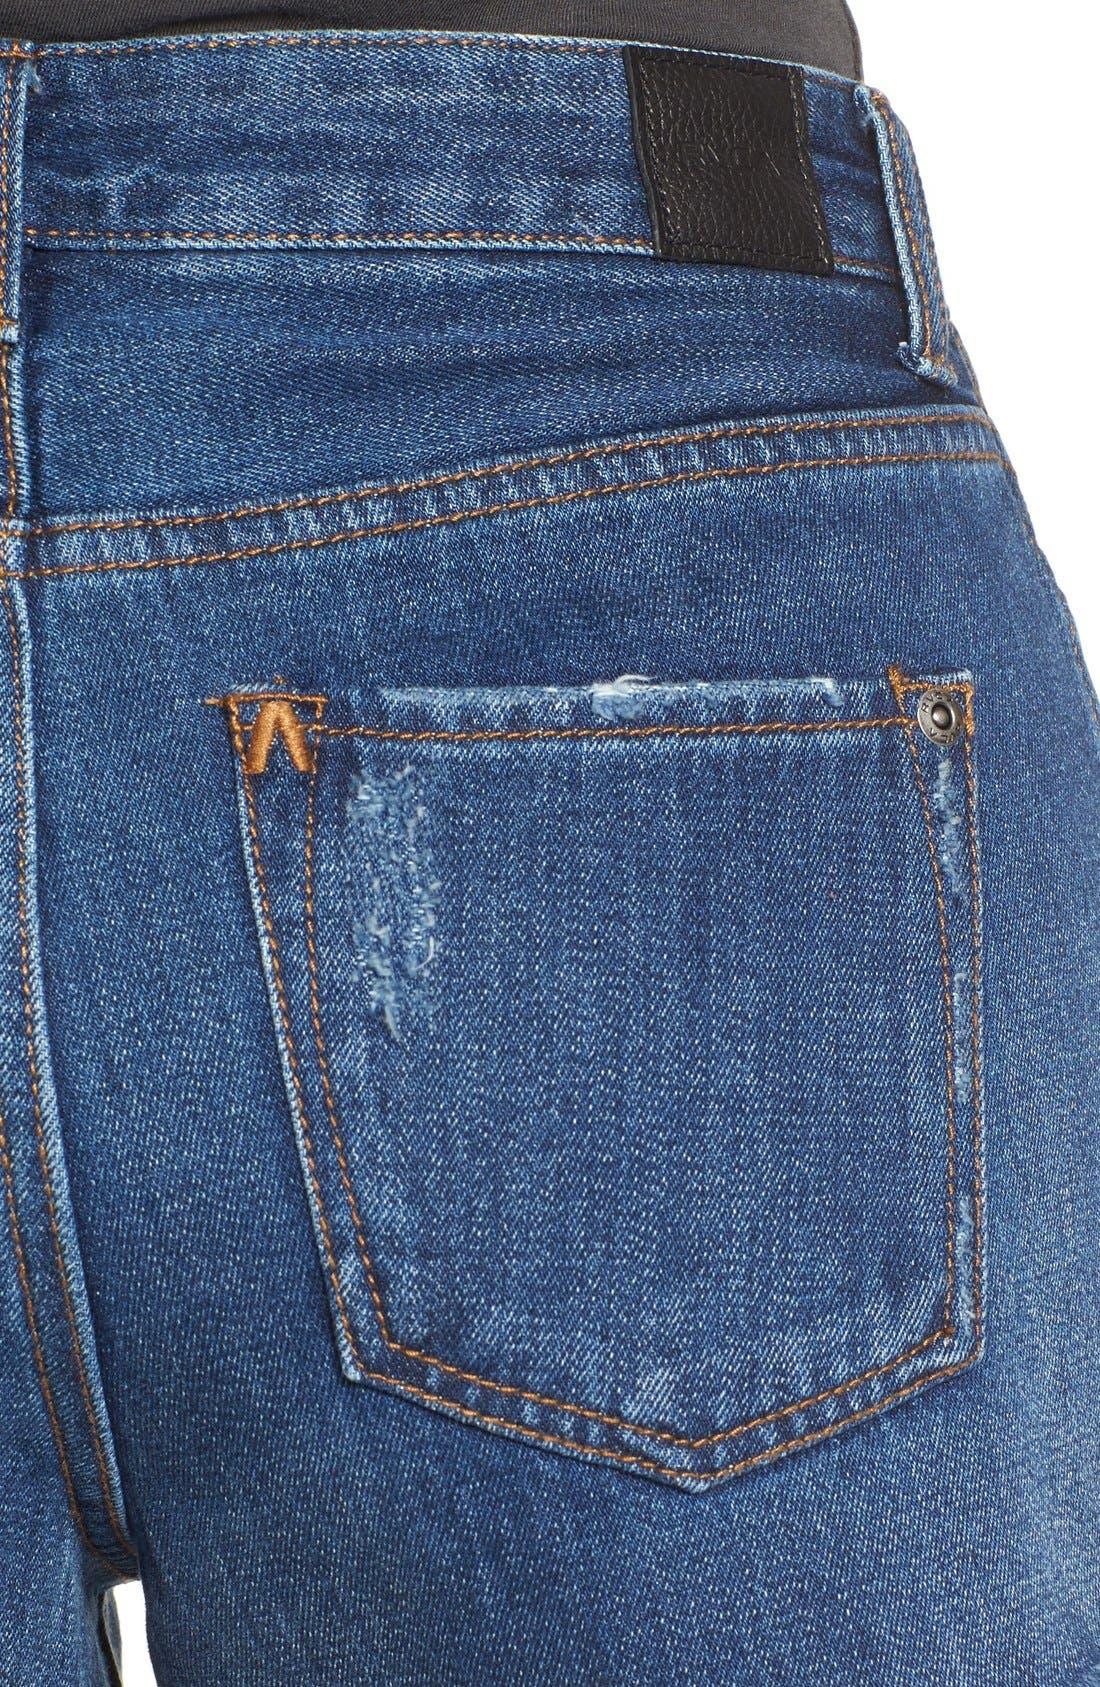 'Highly Vibed' Cutoff Denim Shorts,                             Alternate thumbnail 3, color,                             400